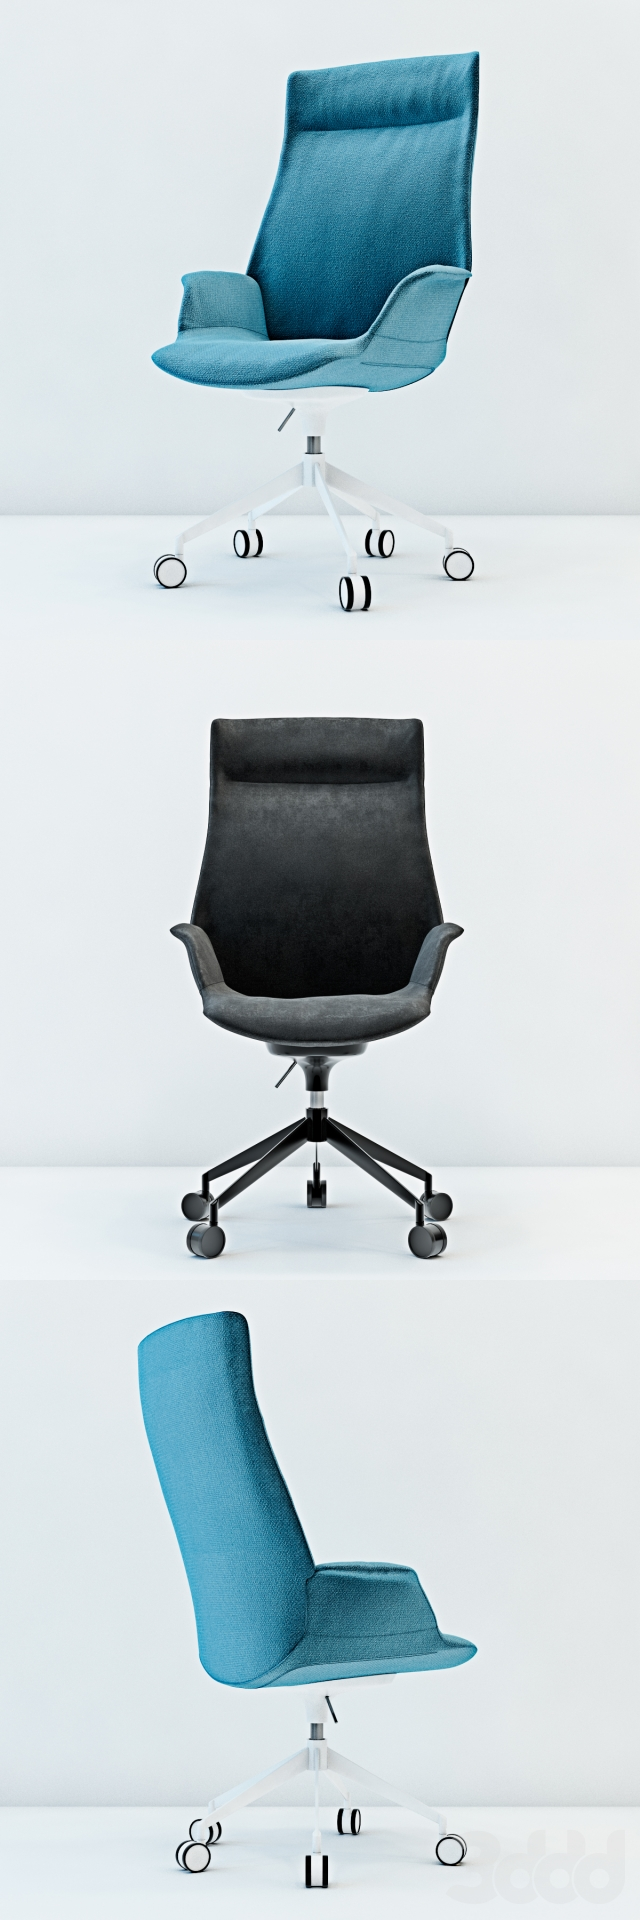 chartered accounta uno chair - 640×1920